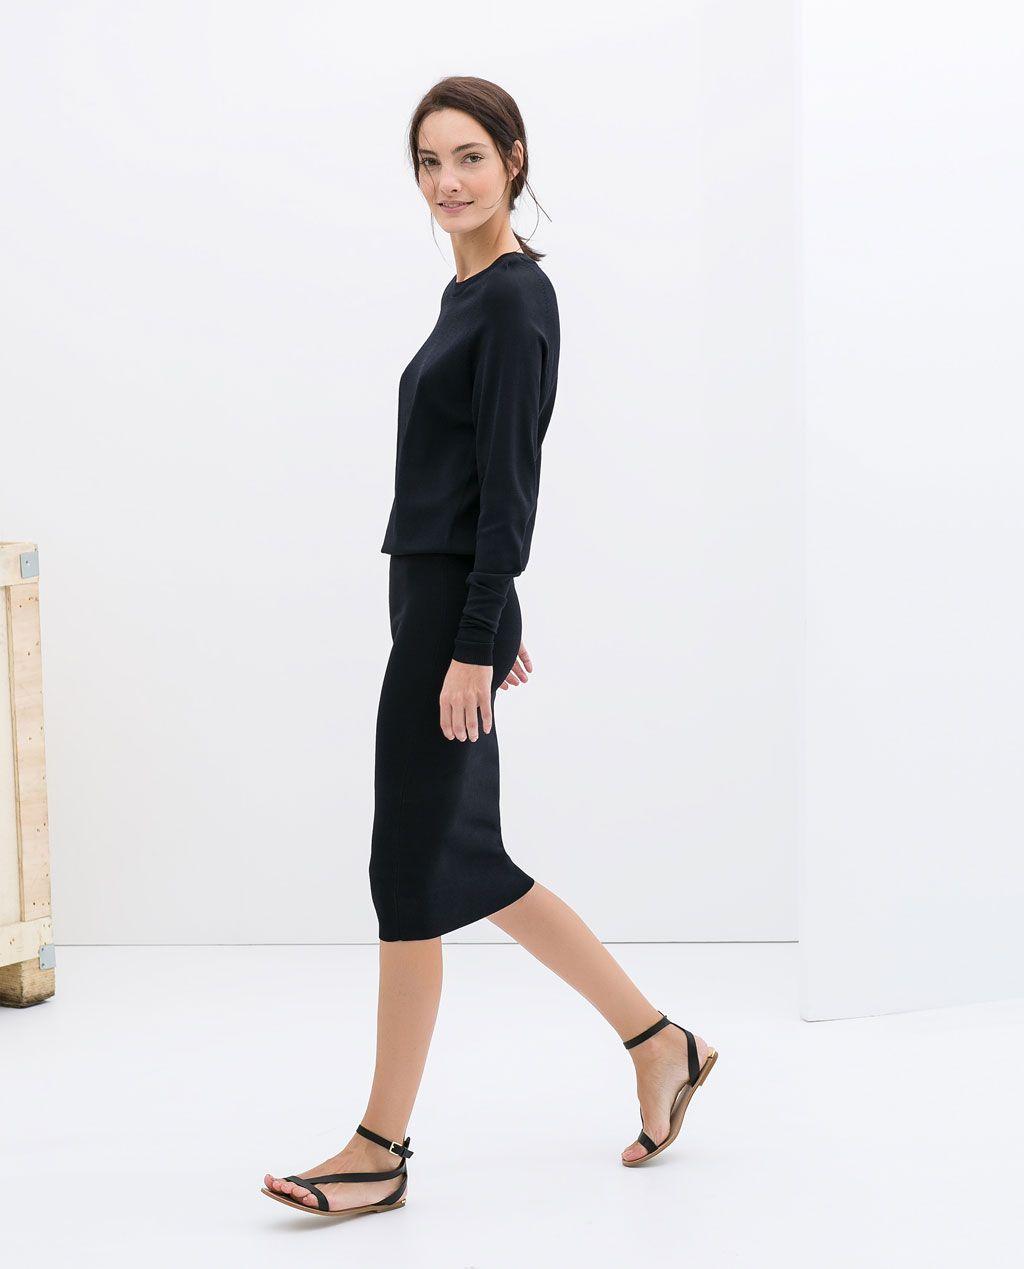 Chic Mujer Falda Zara TuboShoes Black Vestido uZXiPk